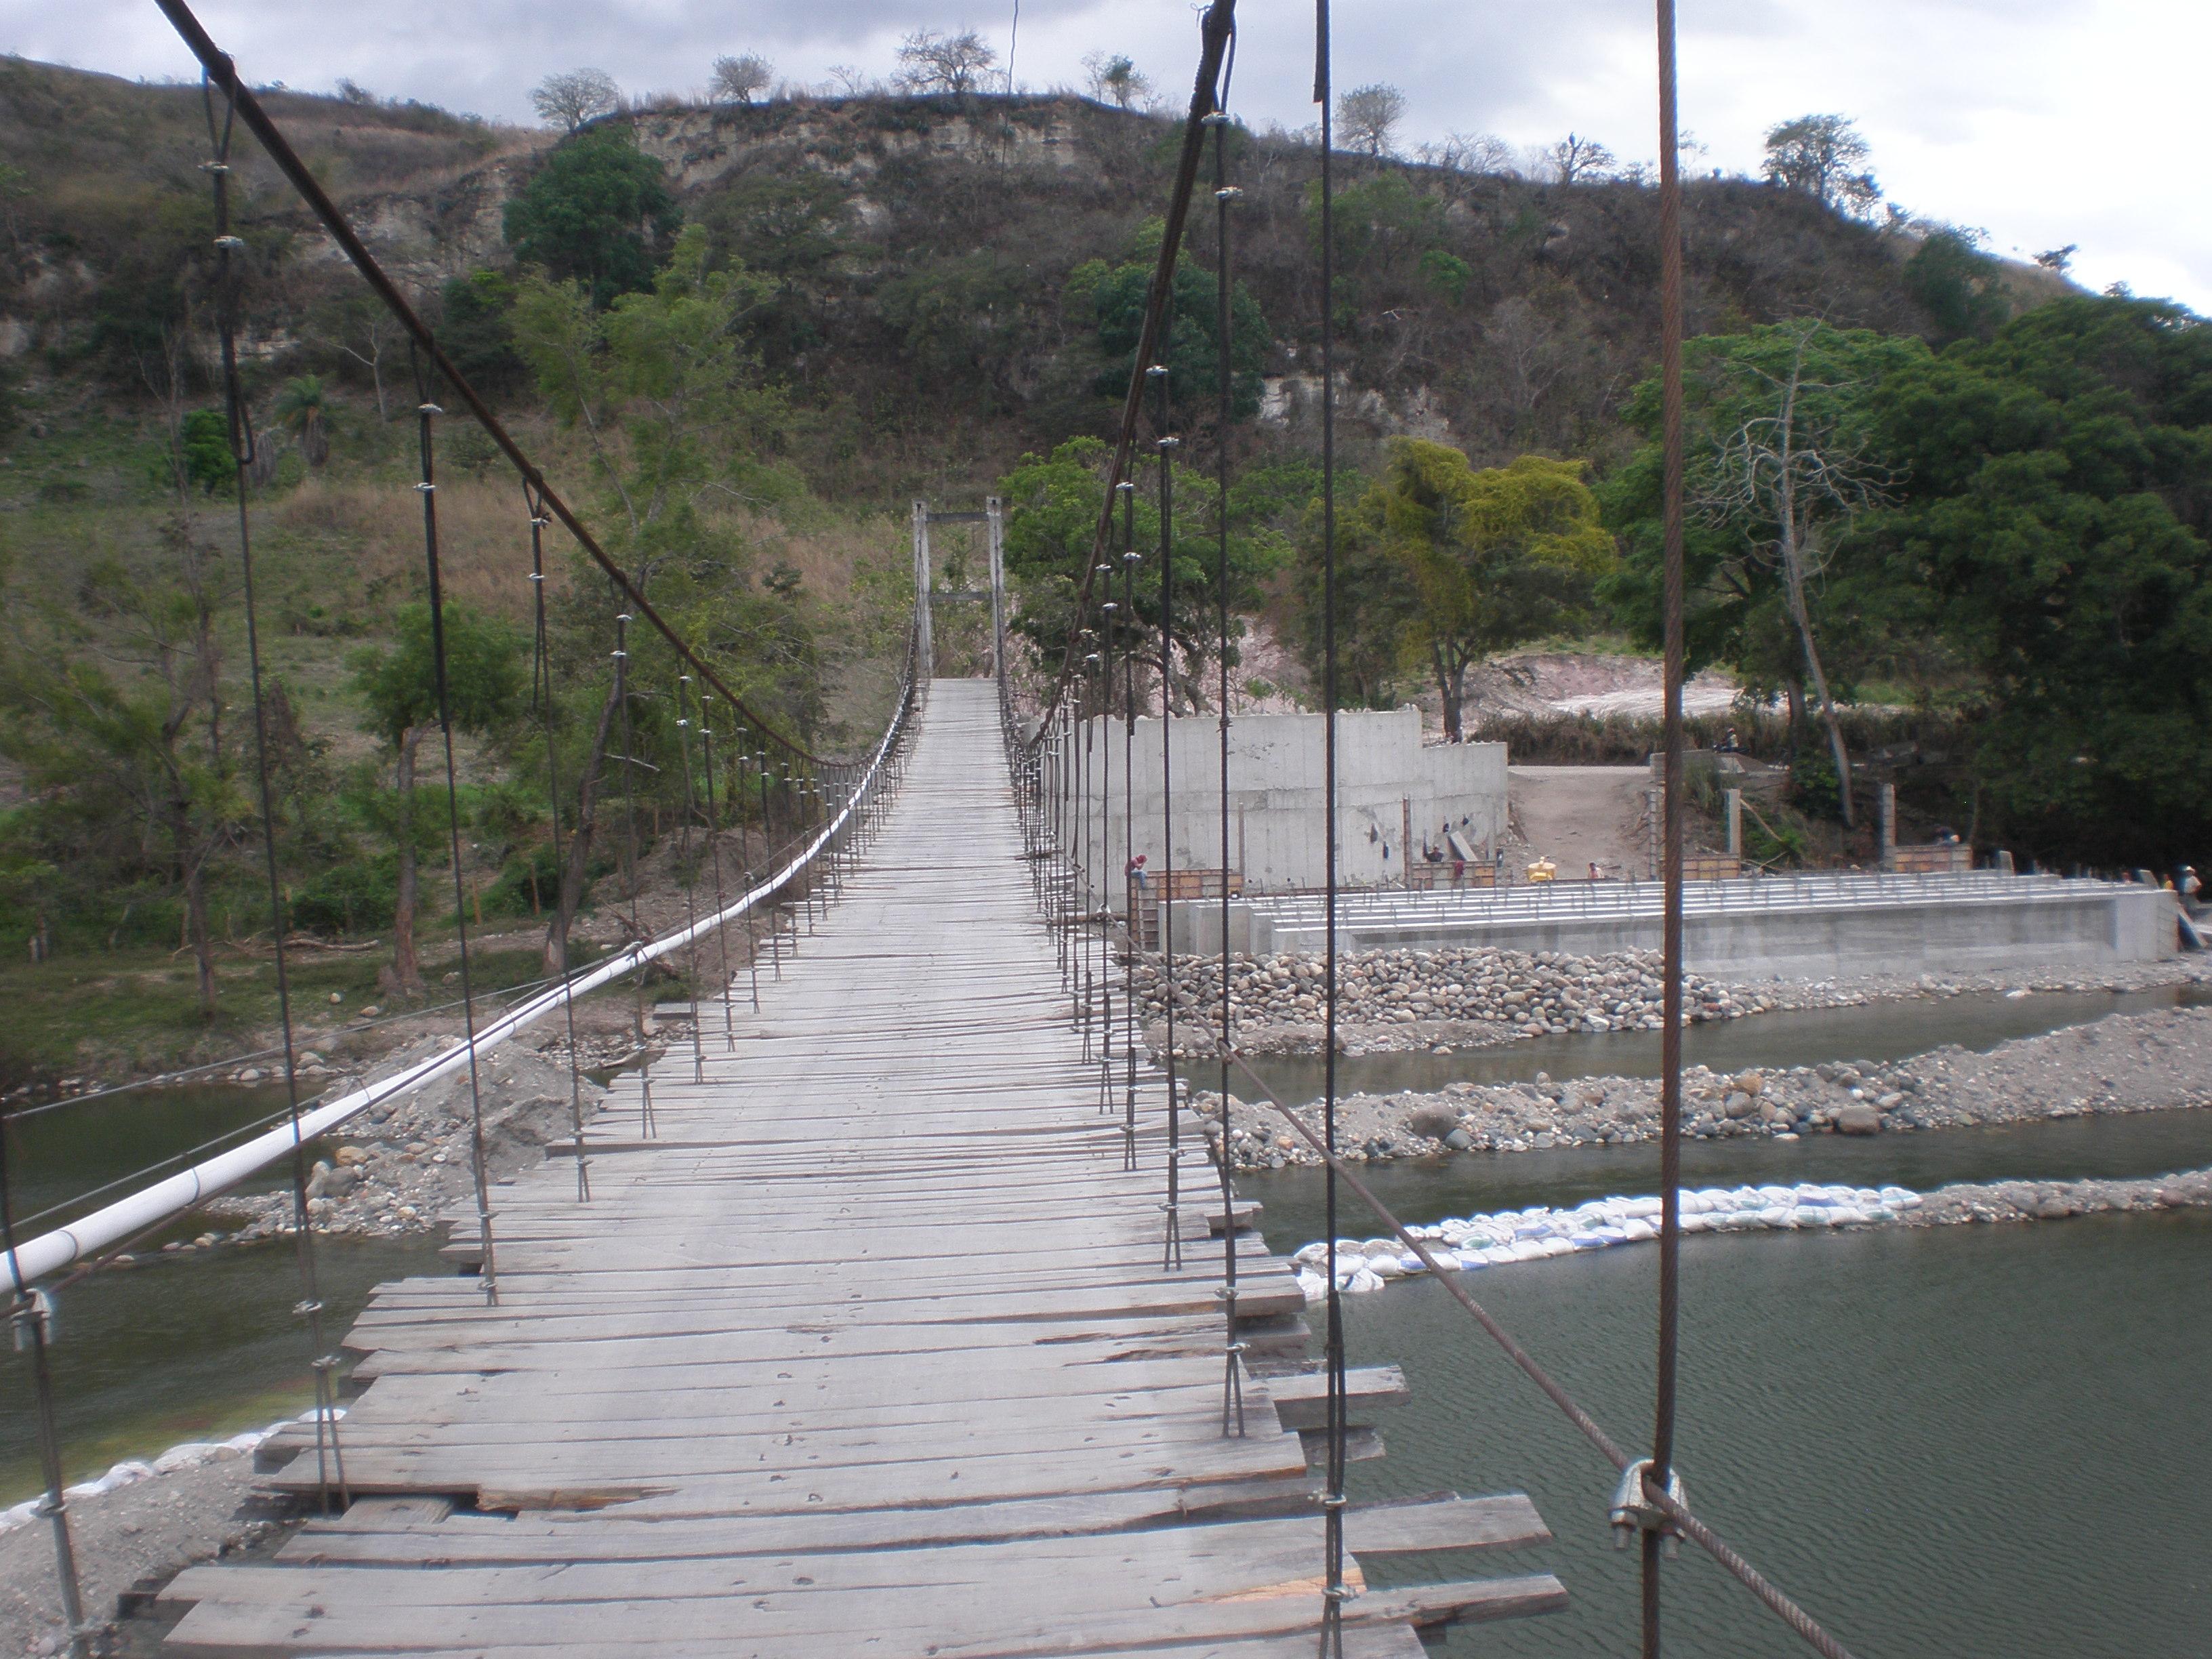 A dangerous Central American borrower visit - Santiago Cortes, Honduras